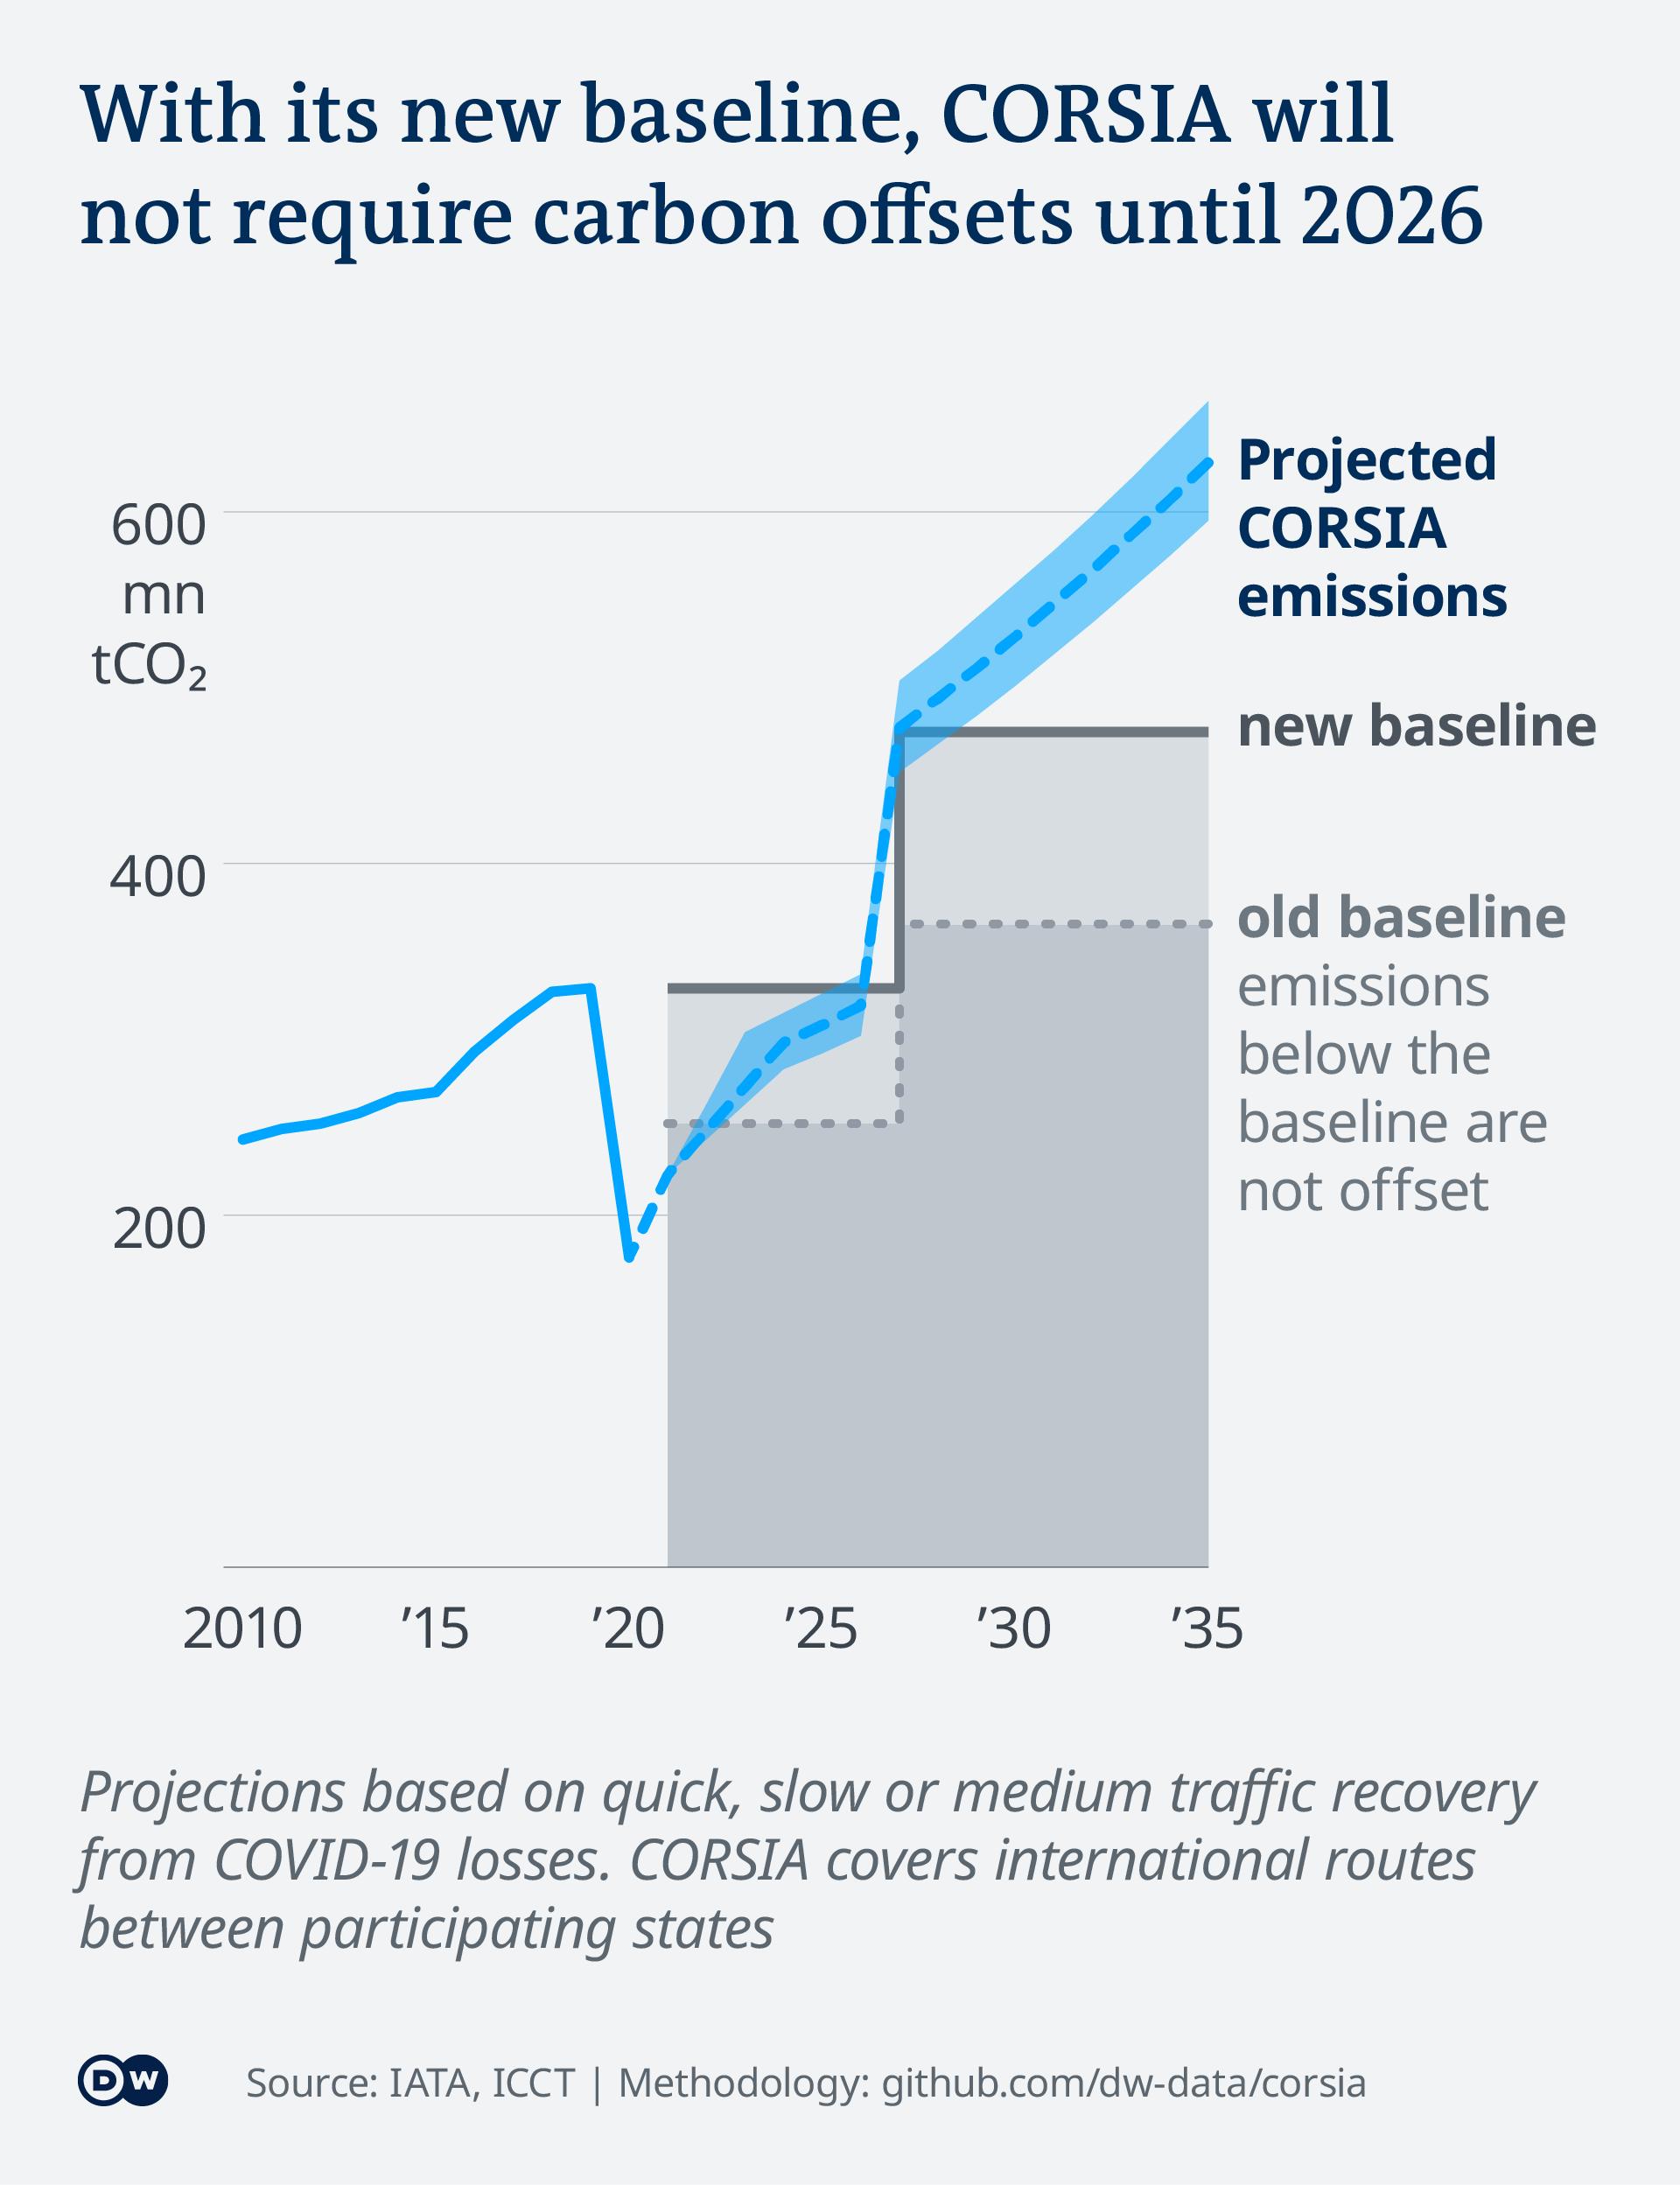 Data visualization EN corsia aviation co2 emissions projections vs baselines